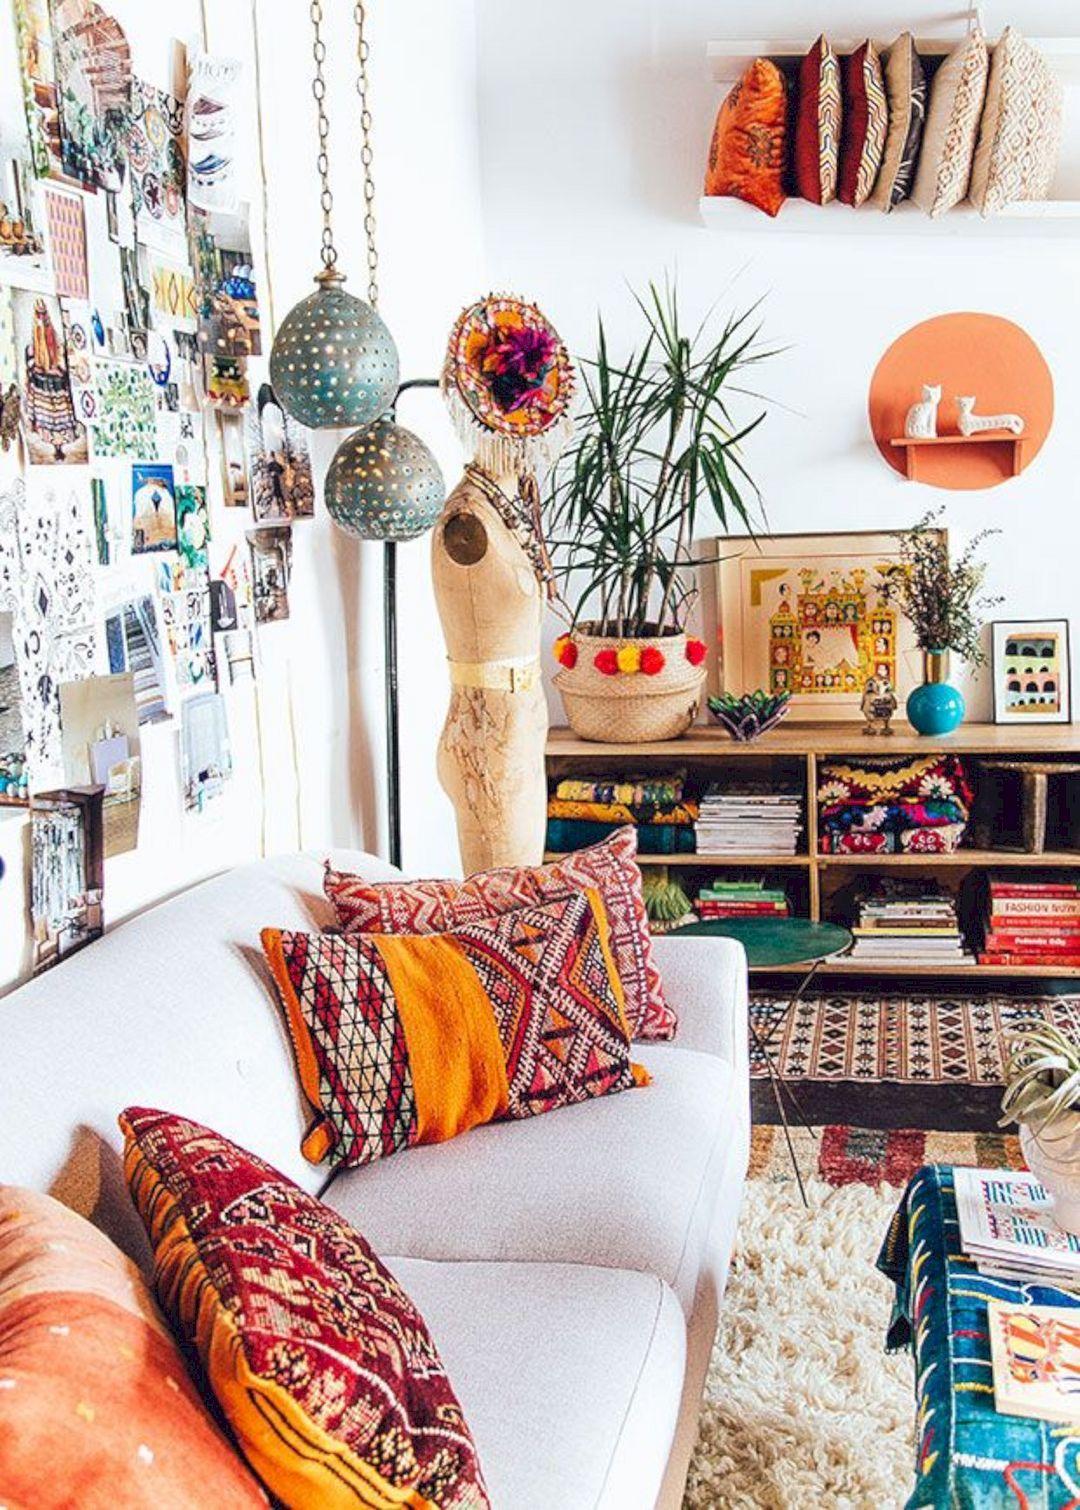 Genial Adorable Bohemian Style Decor Ideas  Https://www.futuristarchitecture.com/26880 Bohemian Style Decor 2.html